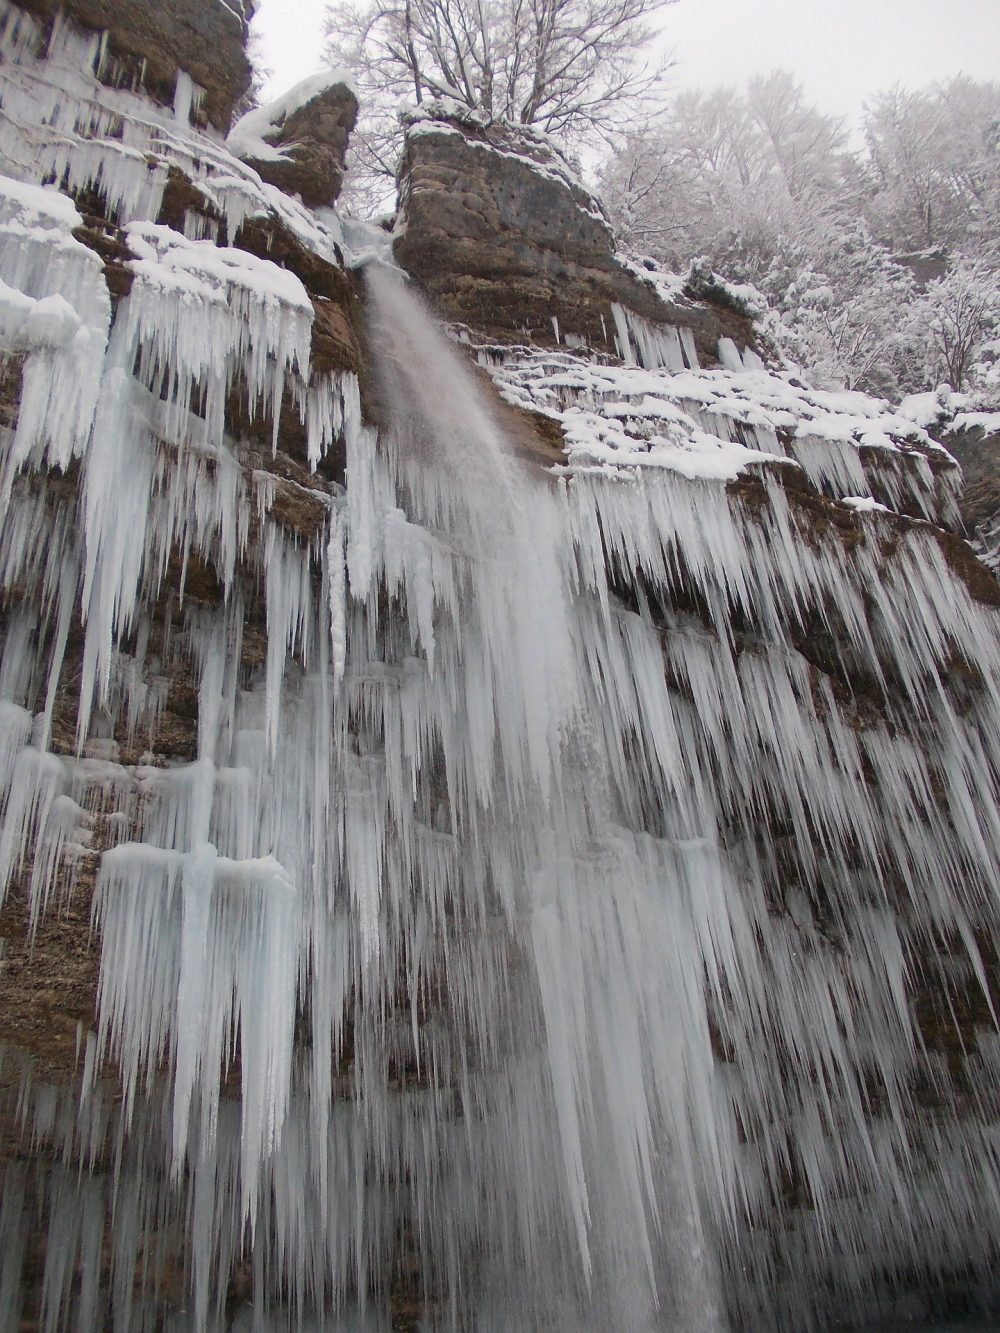 vodopad Tupavica Stara planina zima